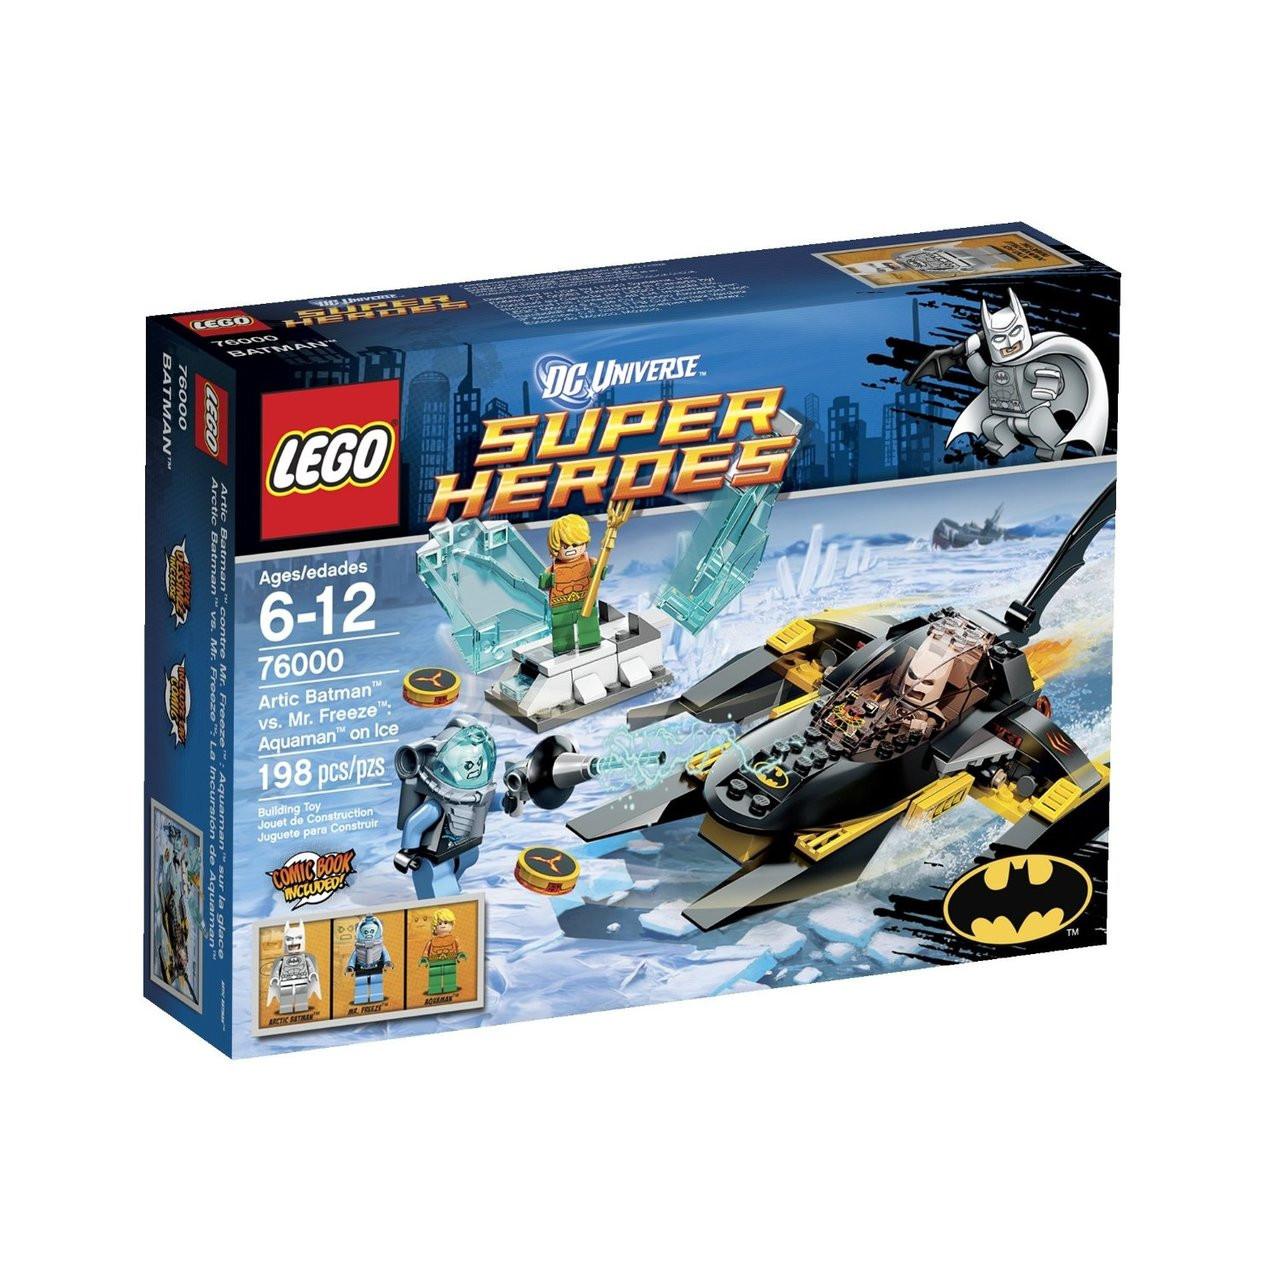 LEGO Mr Freeze Minifigure Marvel Super Heroes Batman and Freeze Gun